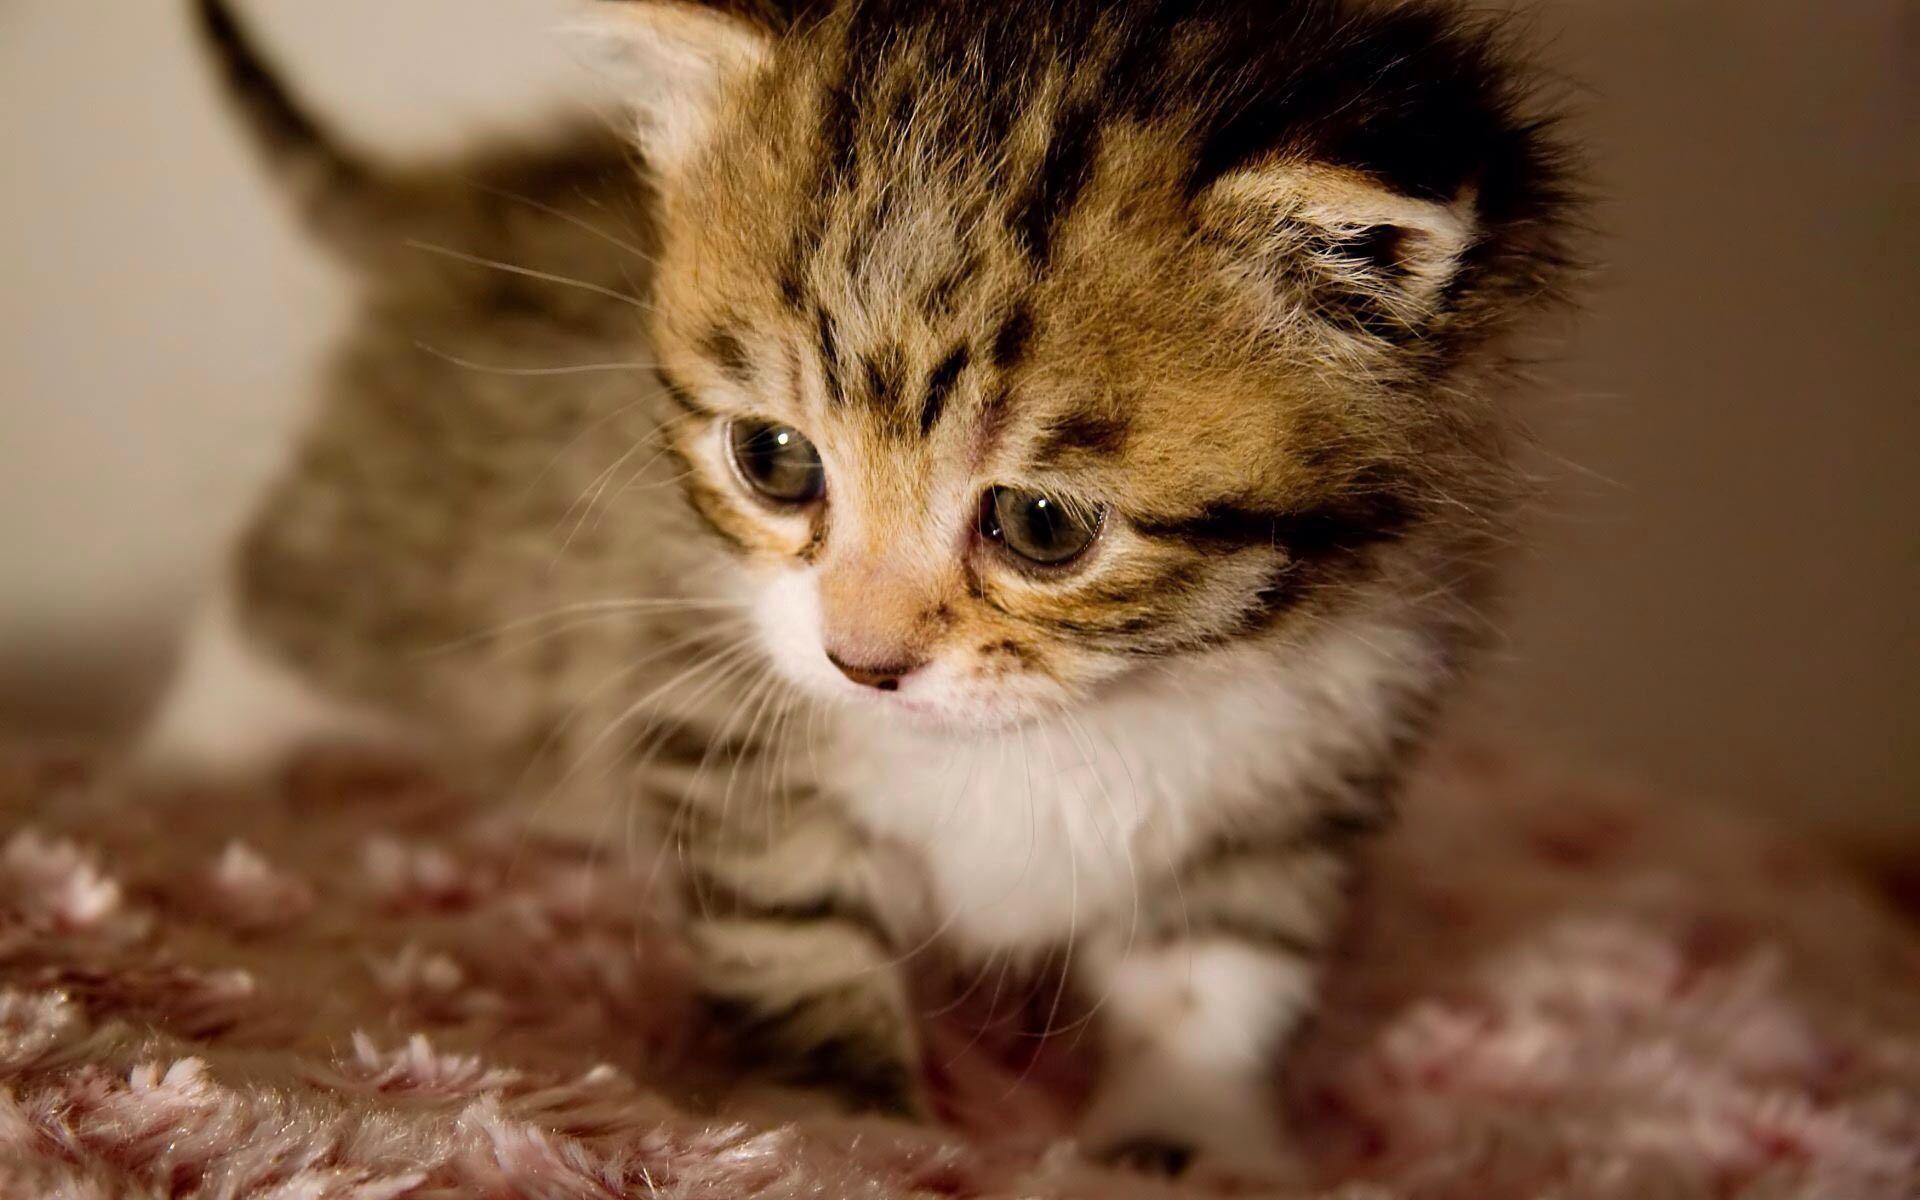 Cute kitten Too cute animals Animals Pinterest